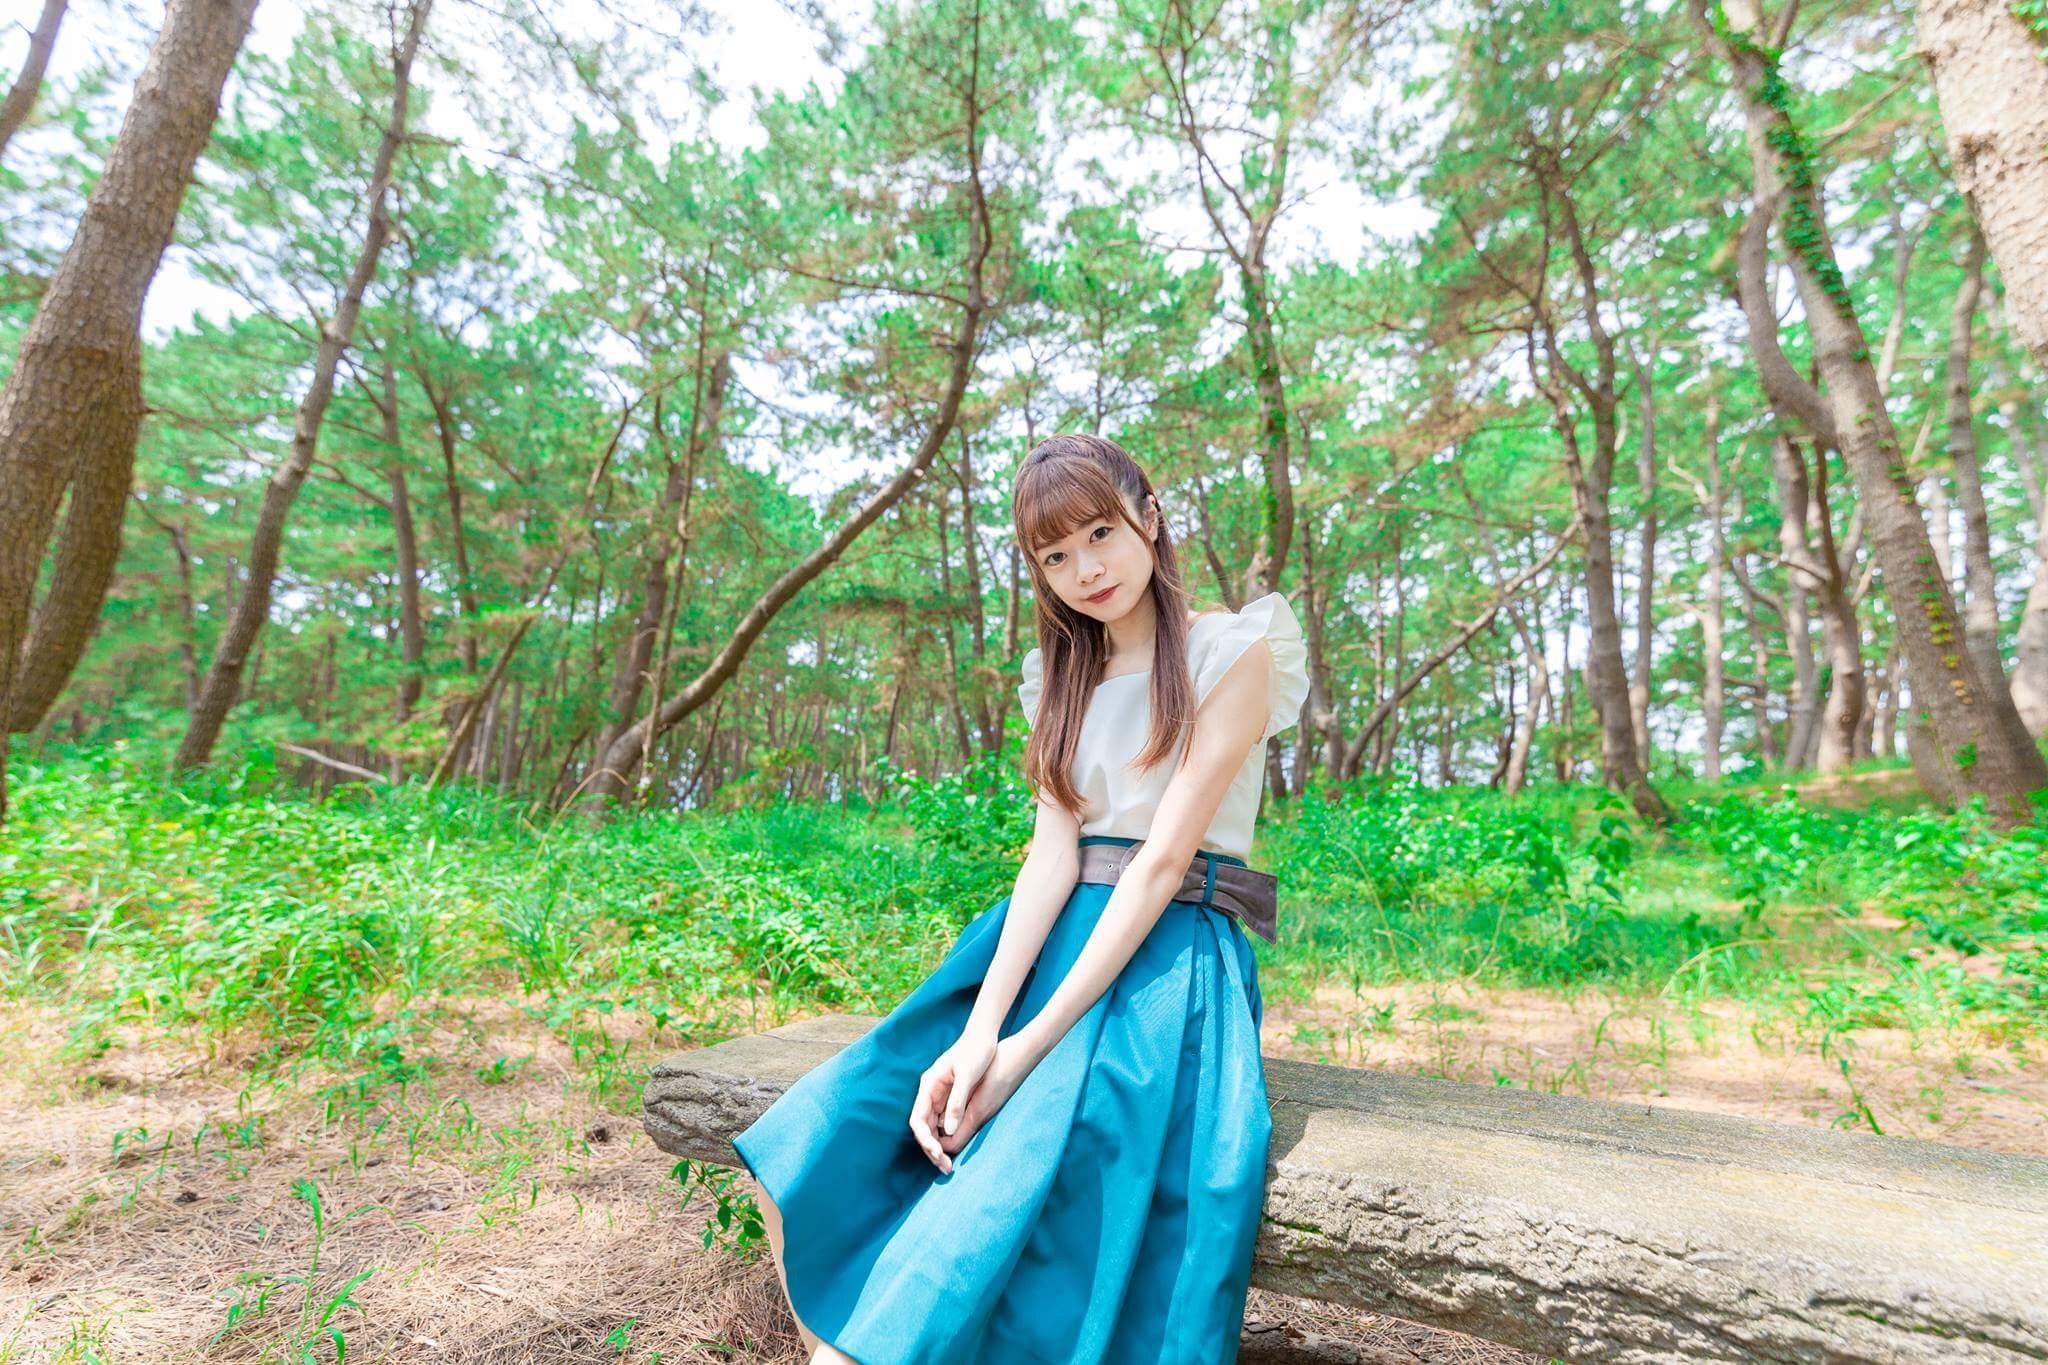 Vol.21♡ 【2017秋コーデ】身長150cm台が着こなす《フレアースカート》_1_3